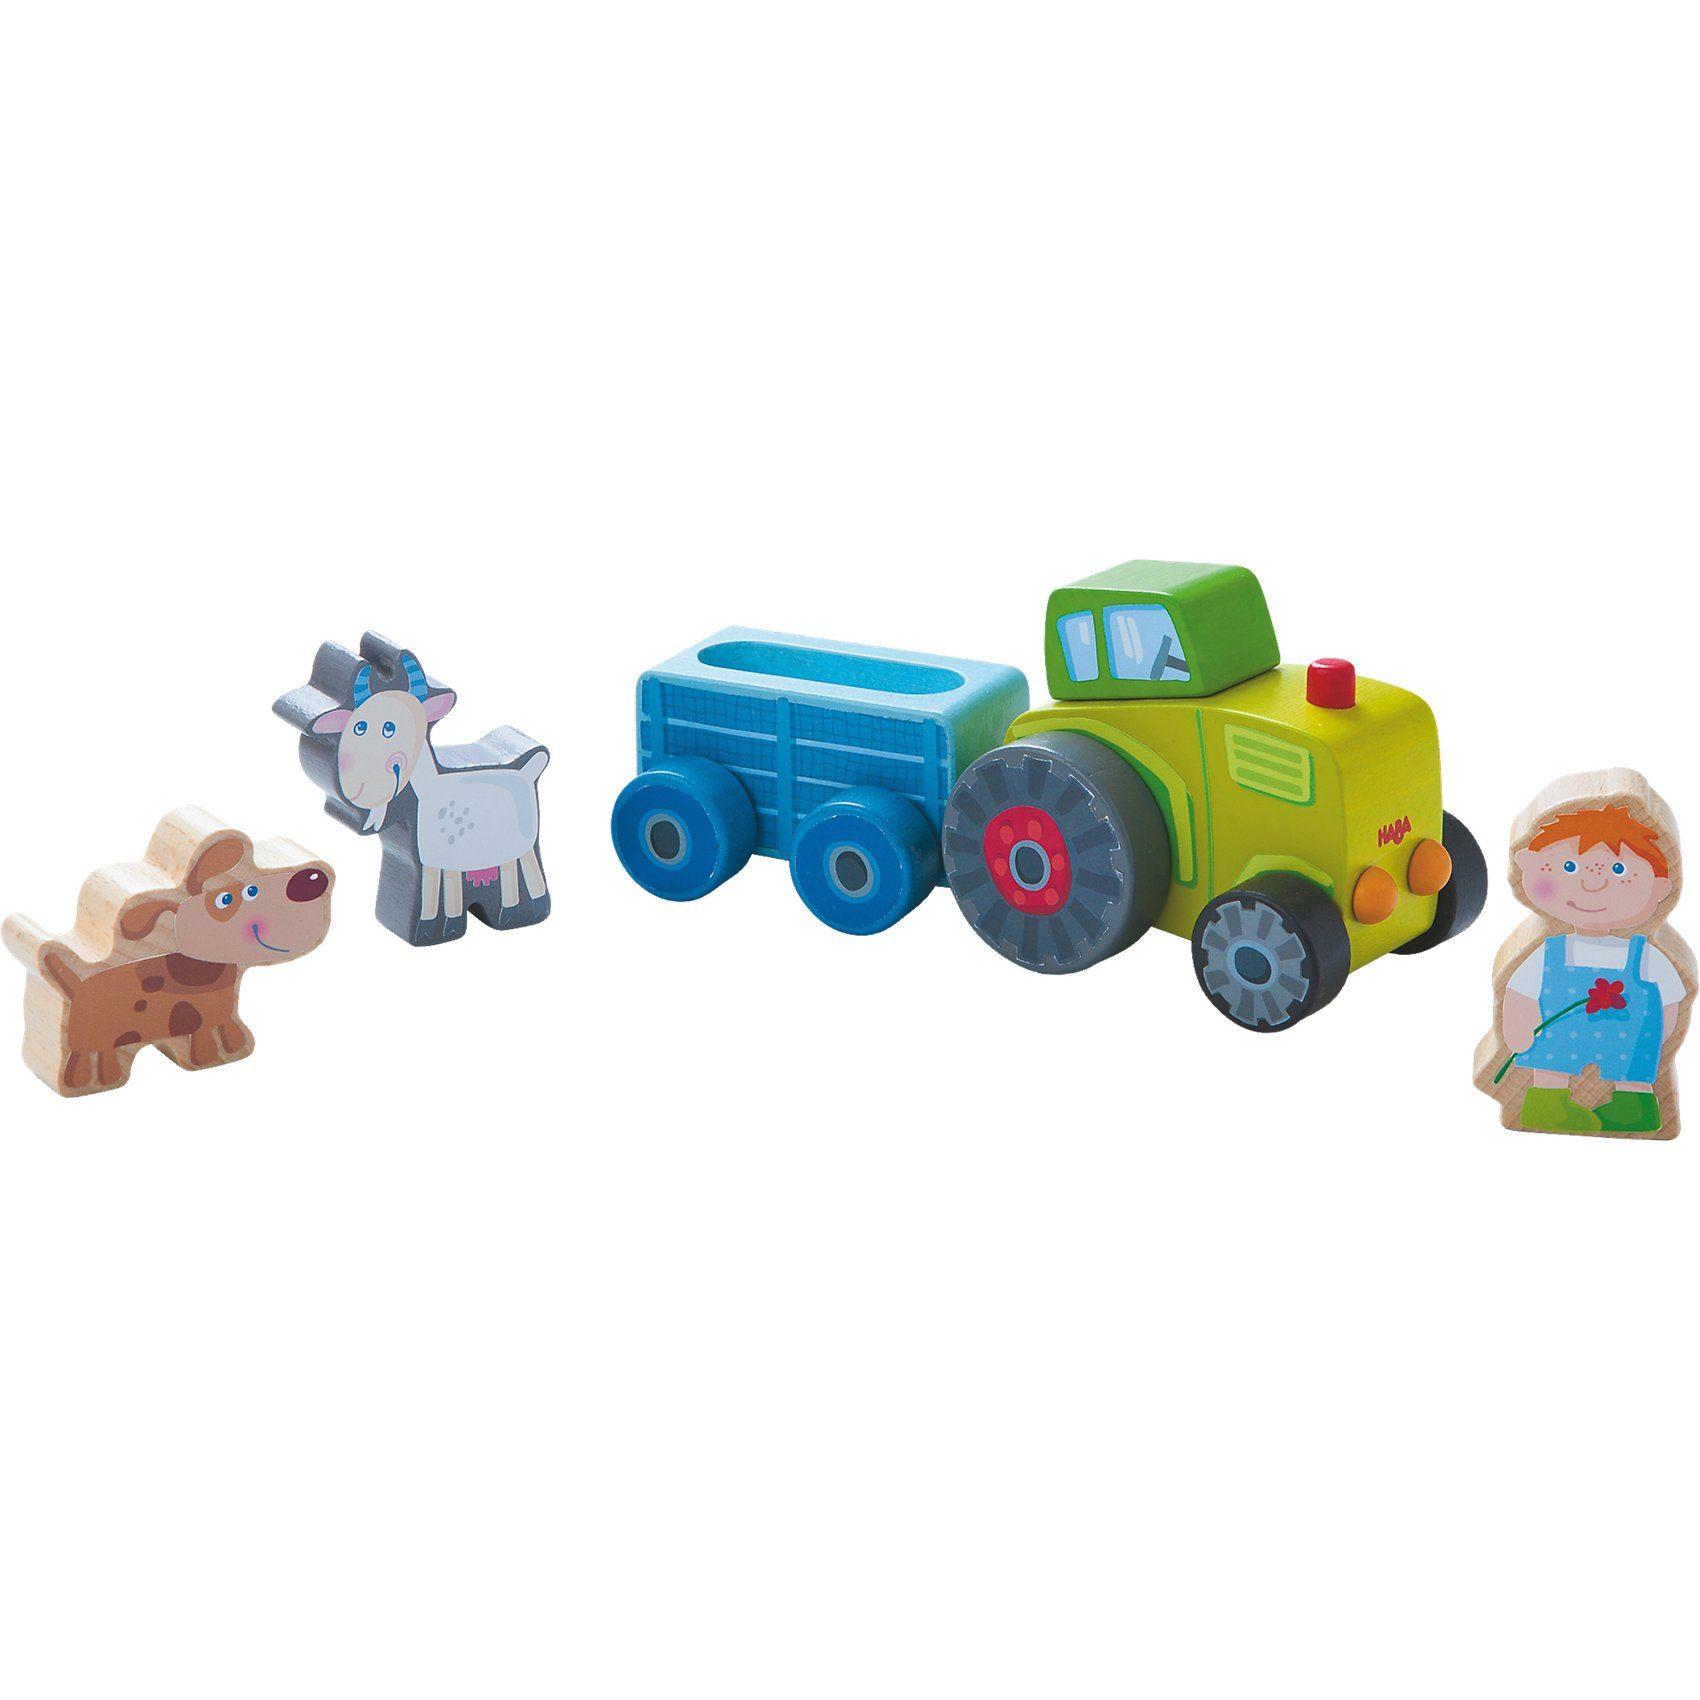 Haba Spielwelt Peters Traktor